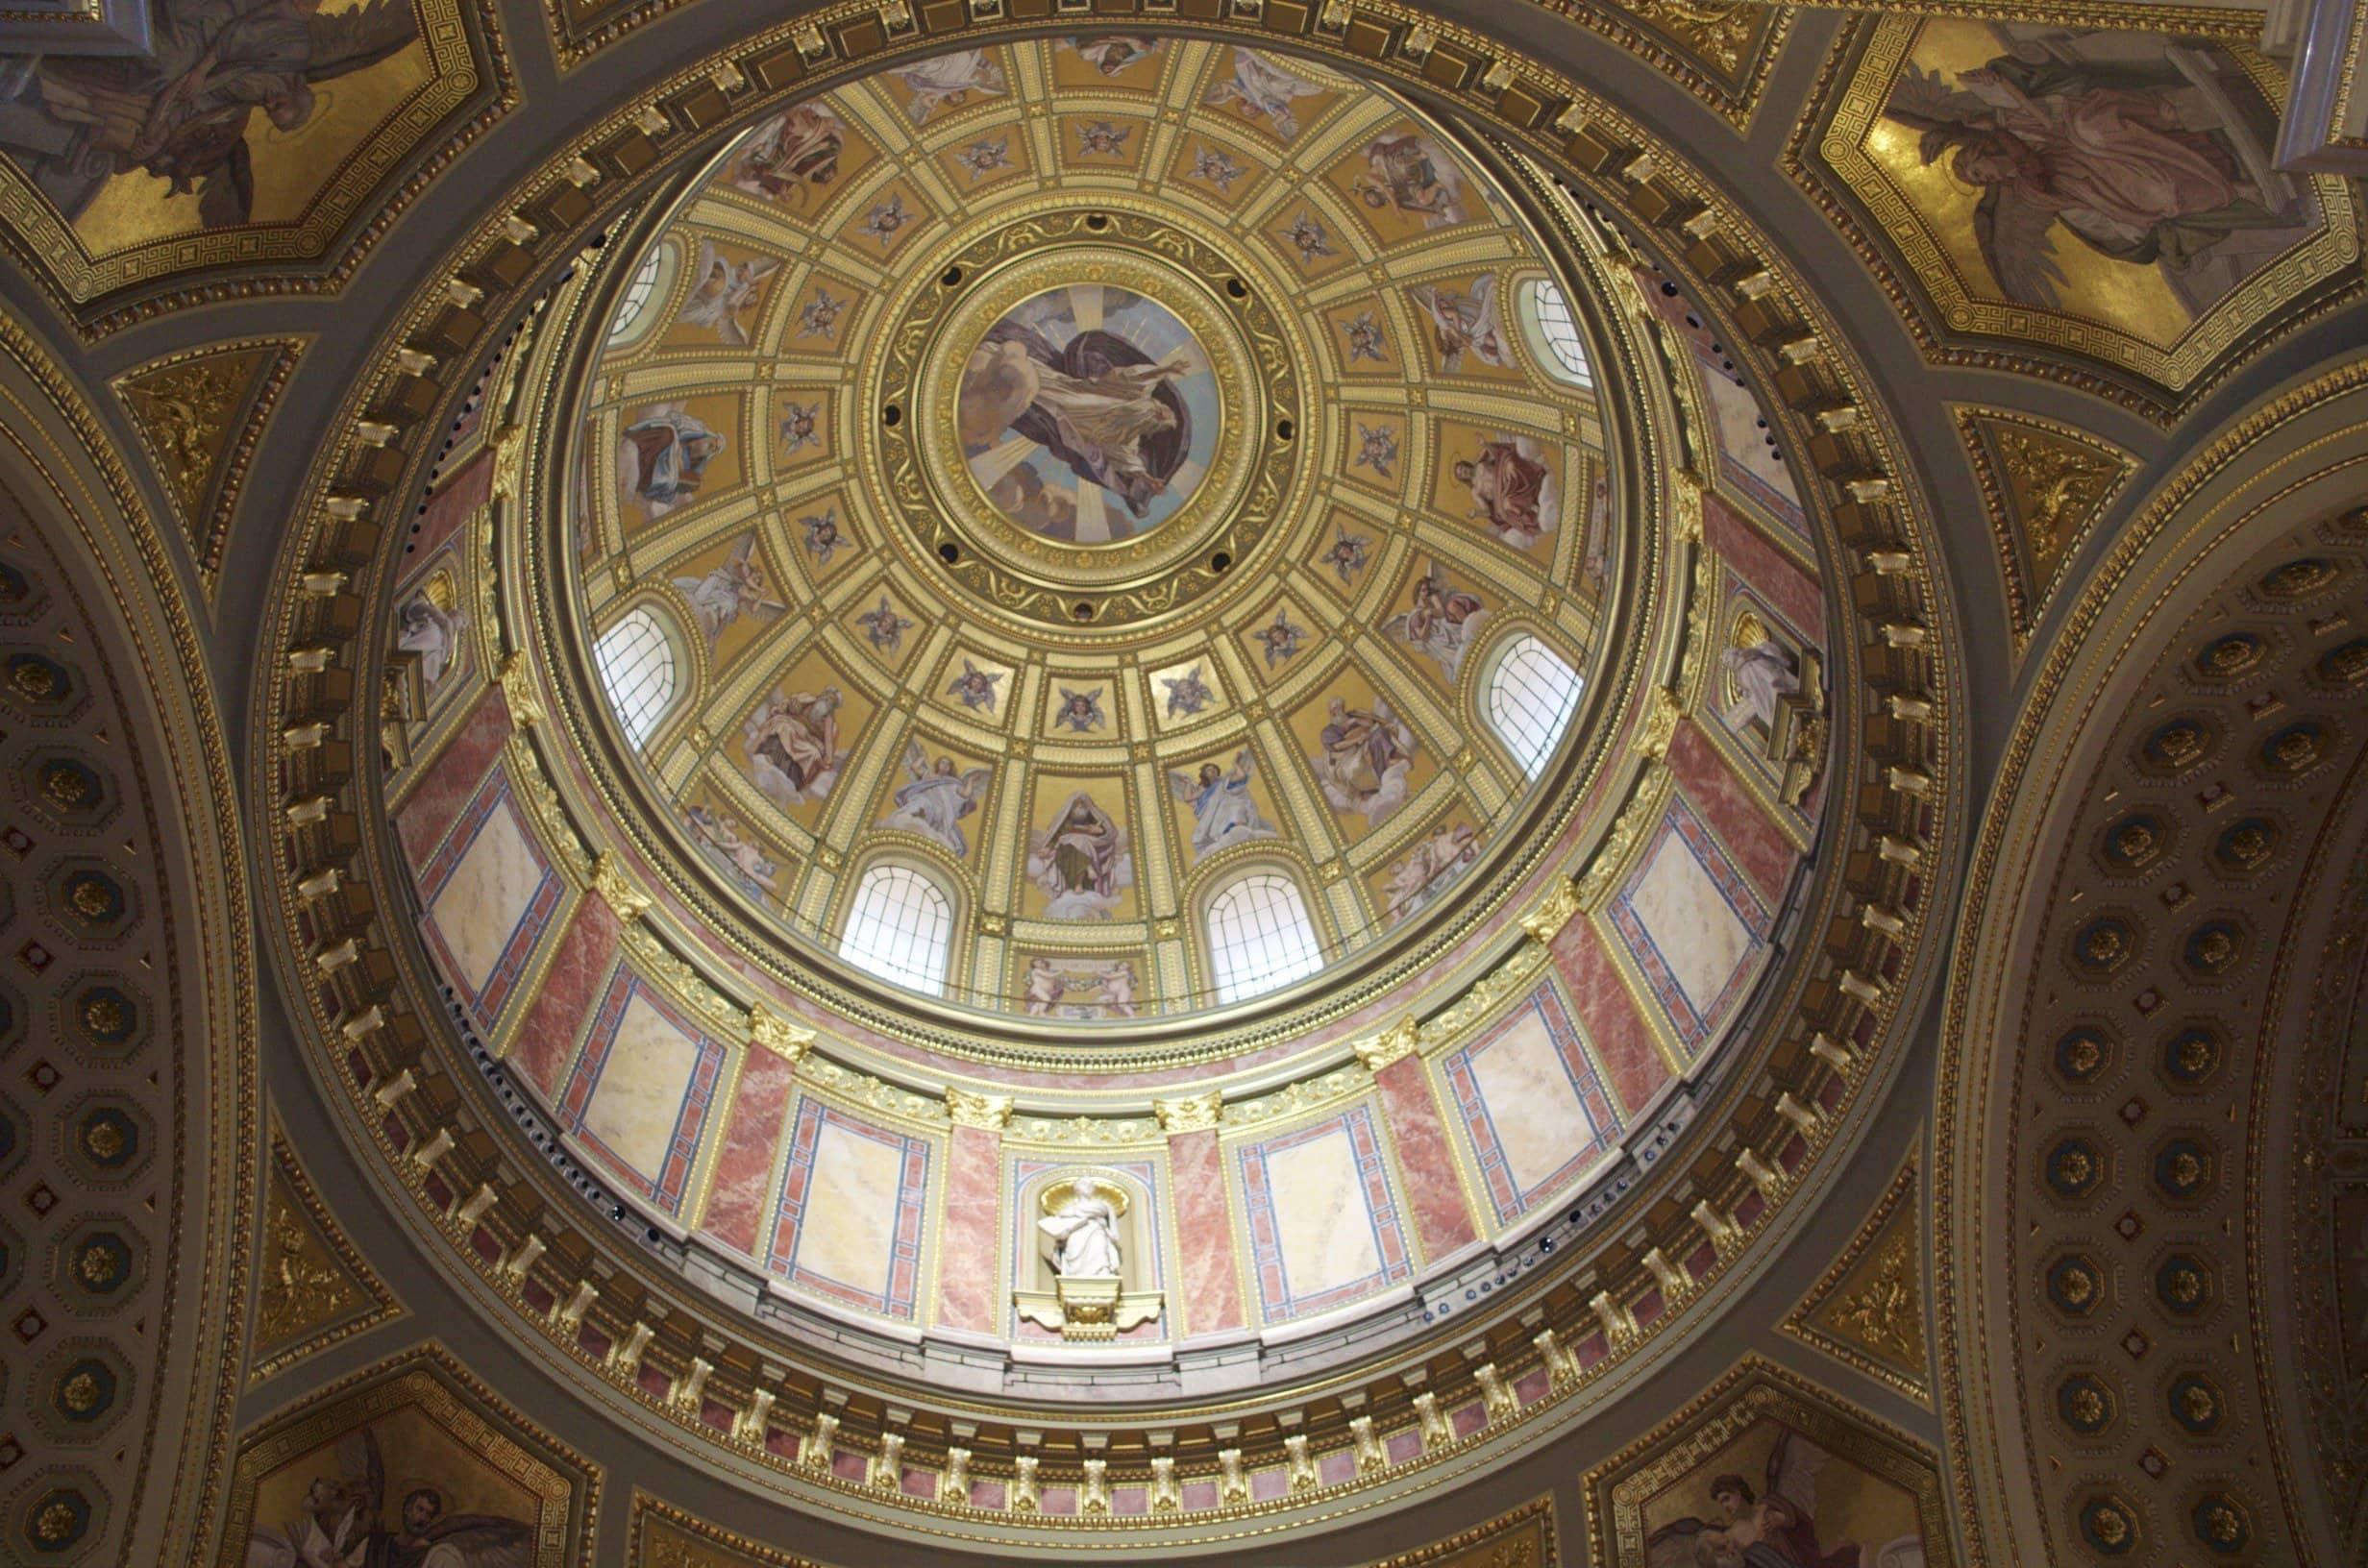 Kuppel der St. Stephans Basilica Budapest